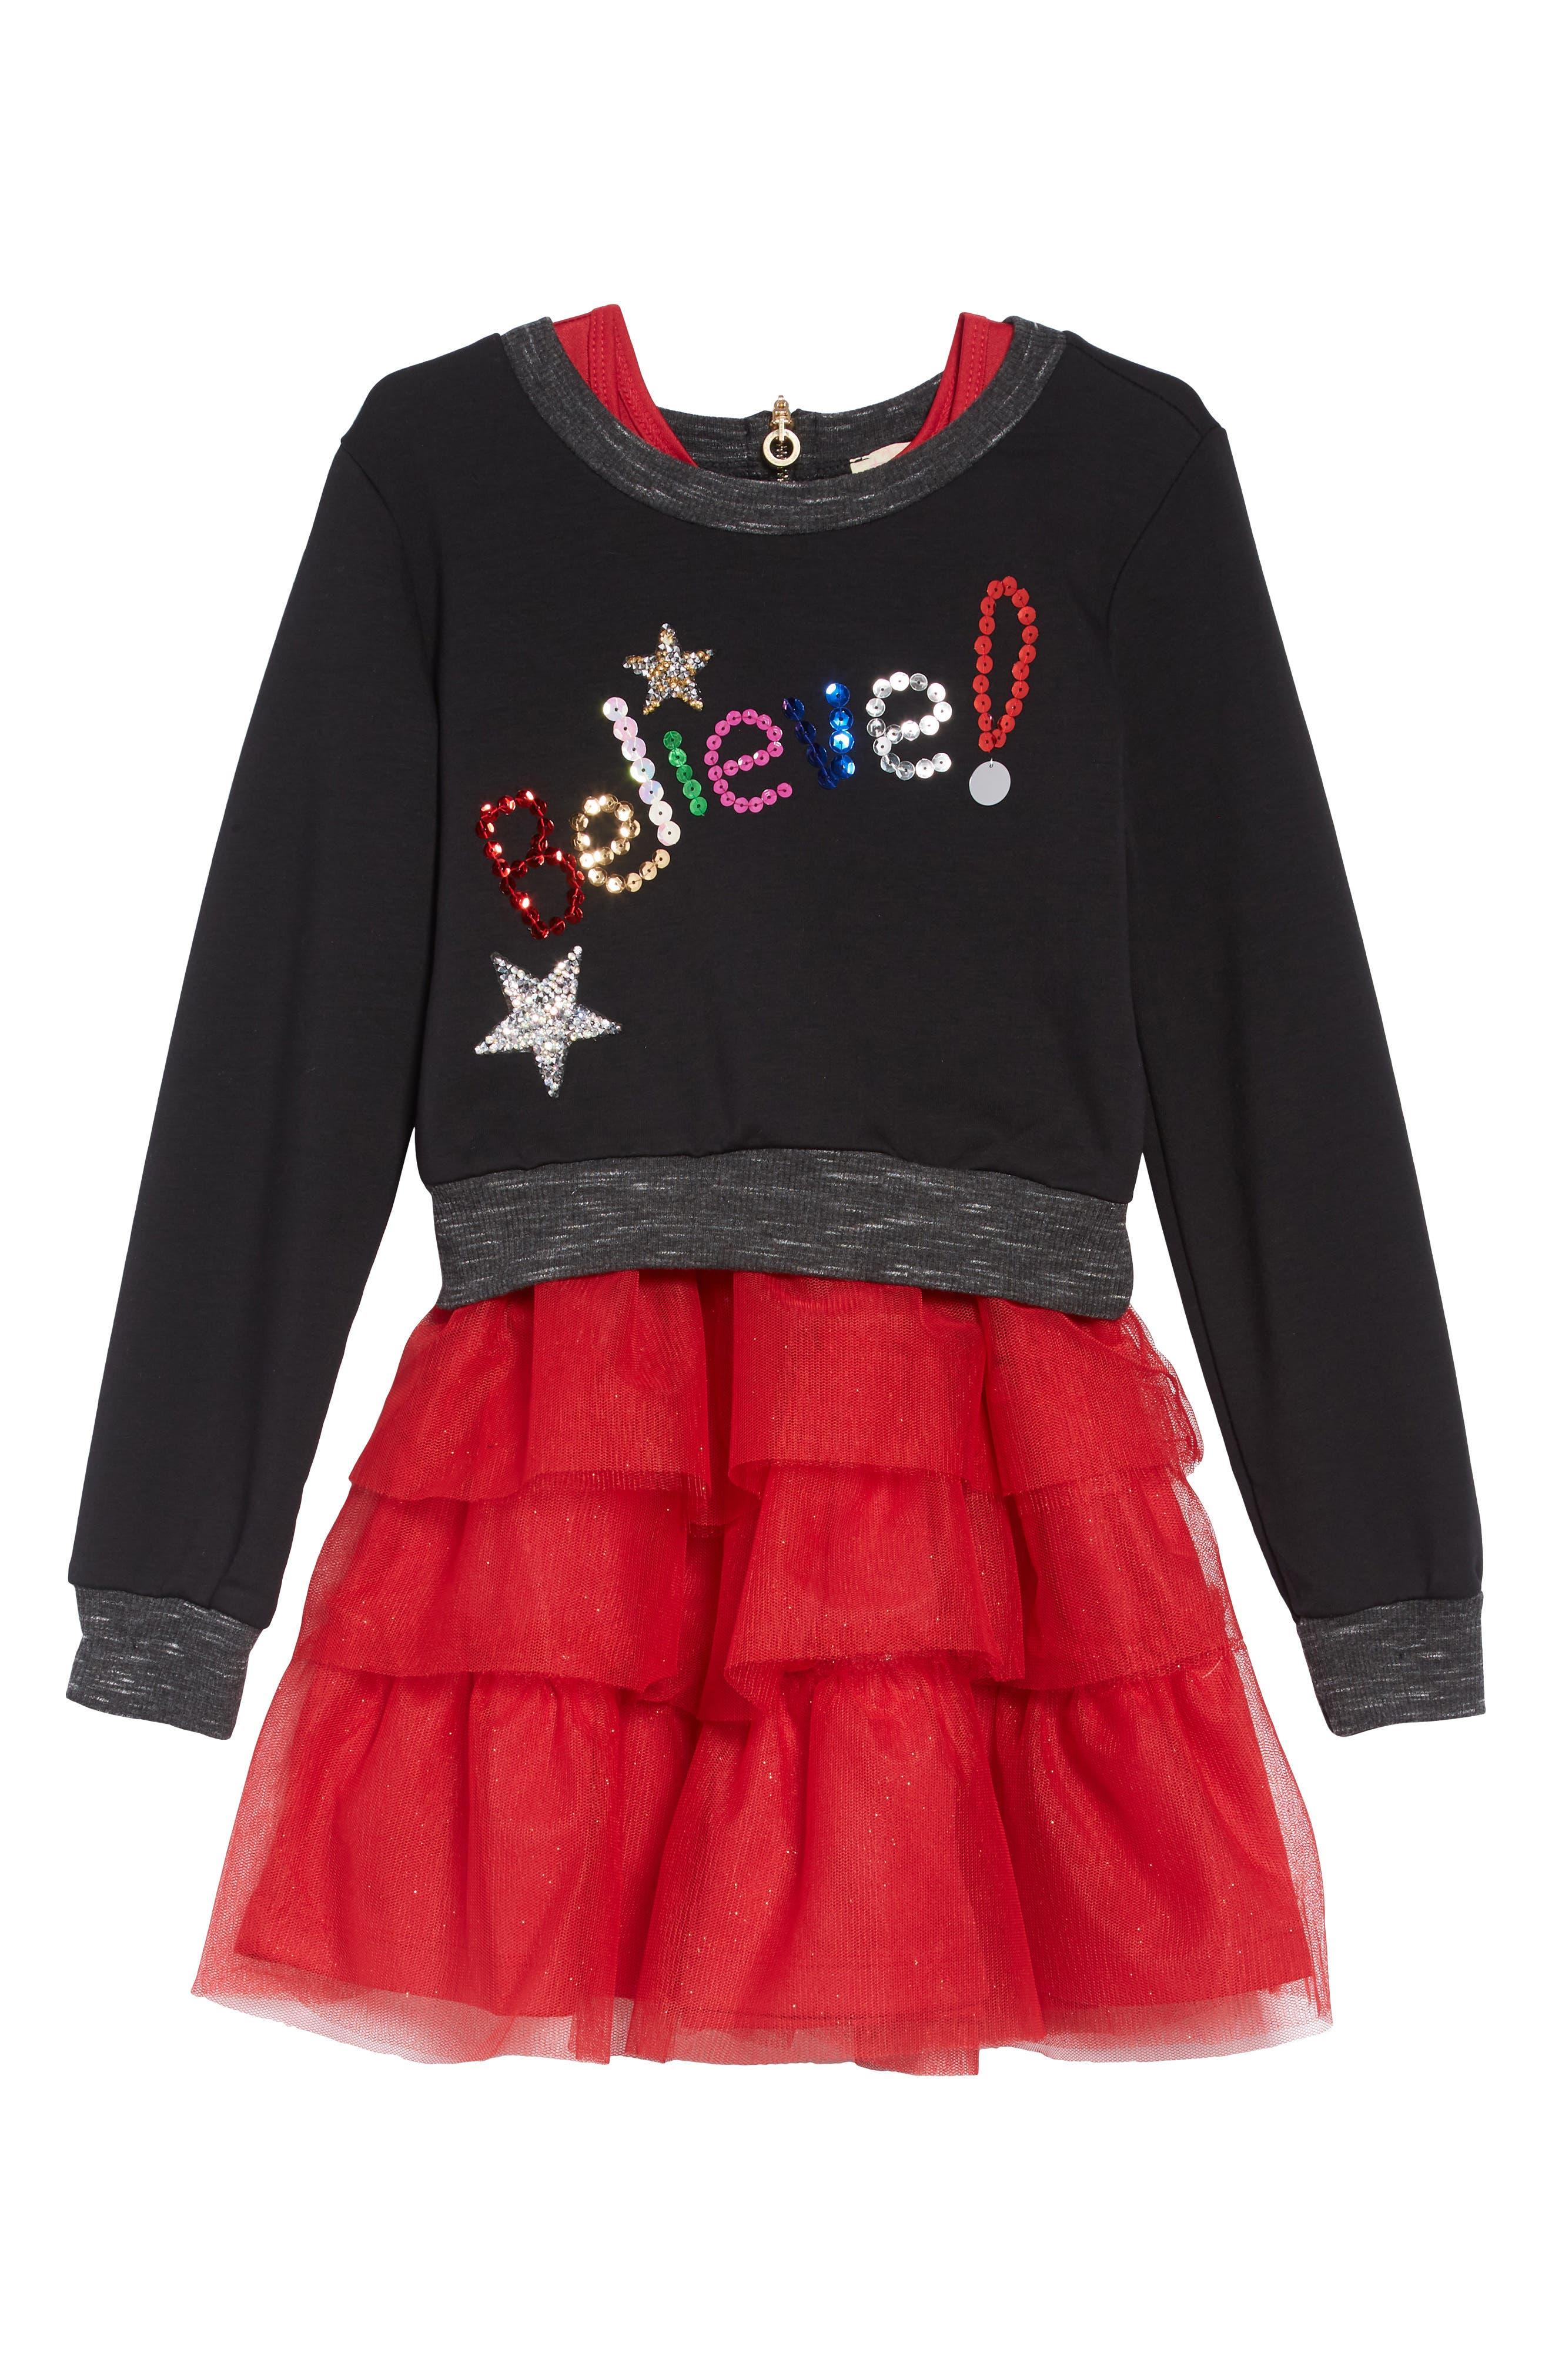 Believe Sequin Appliqué Sweatshirt & Tulle Dress Set,                         Main,                         color, BLACK RED